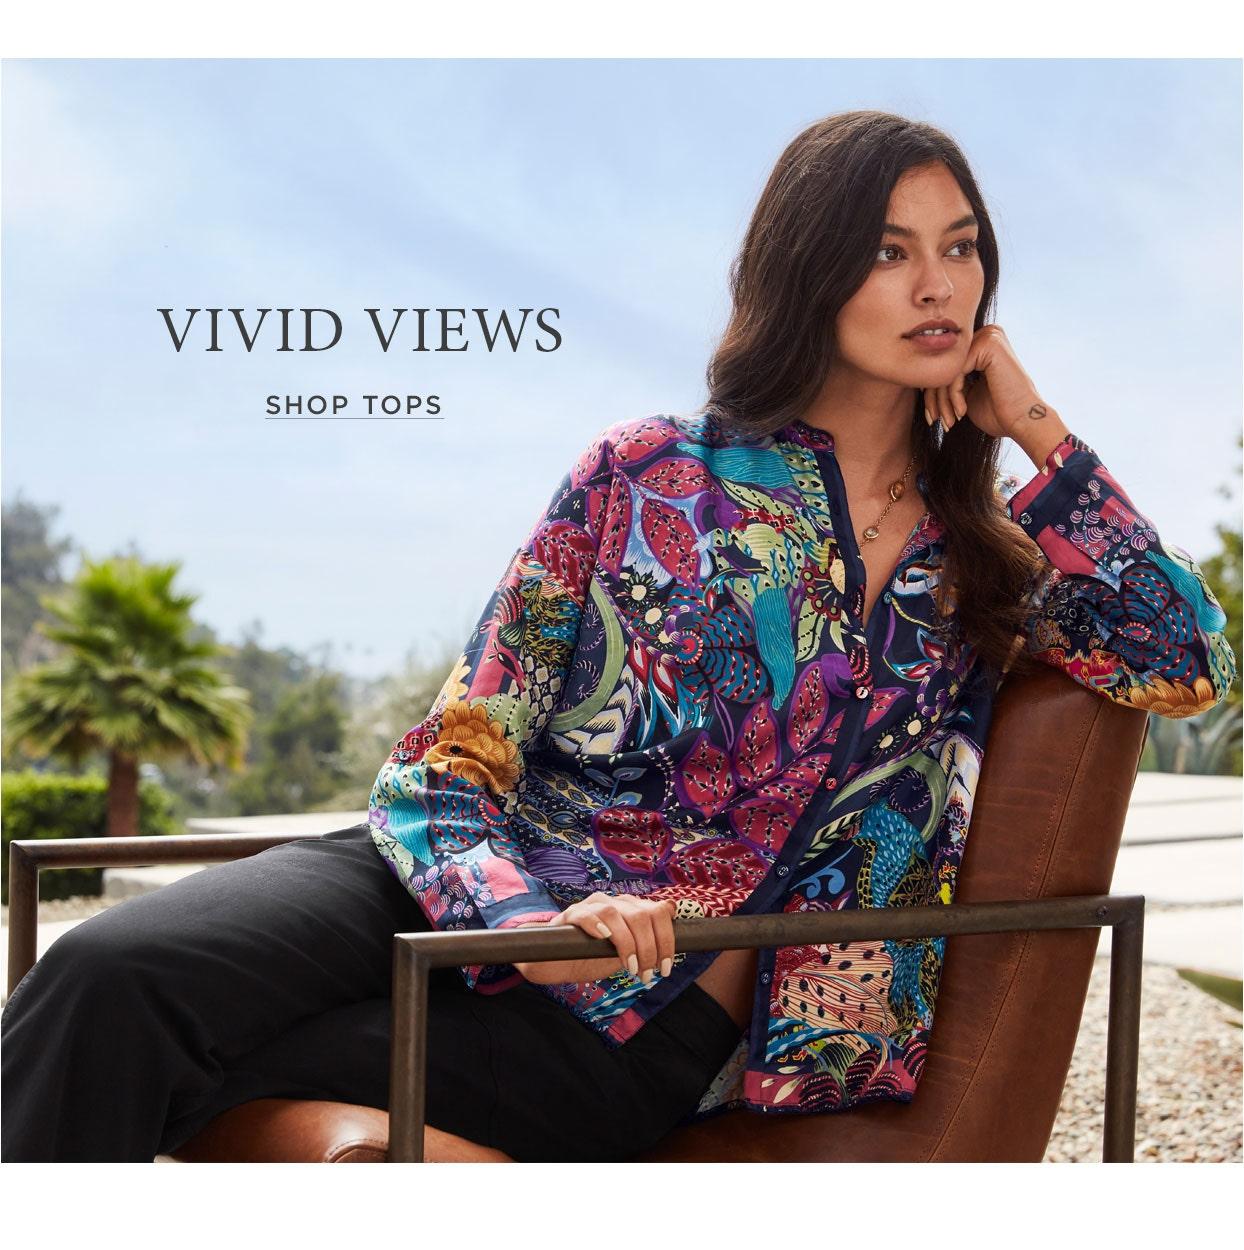 Vivid Views – Shop Tops